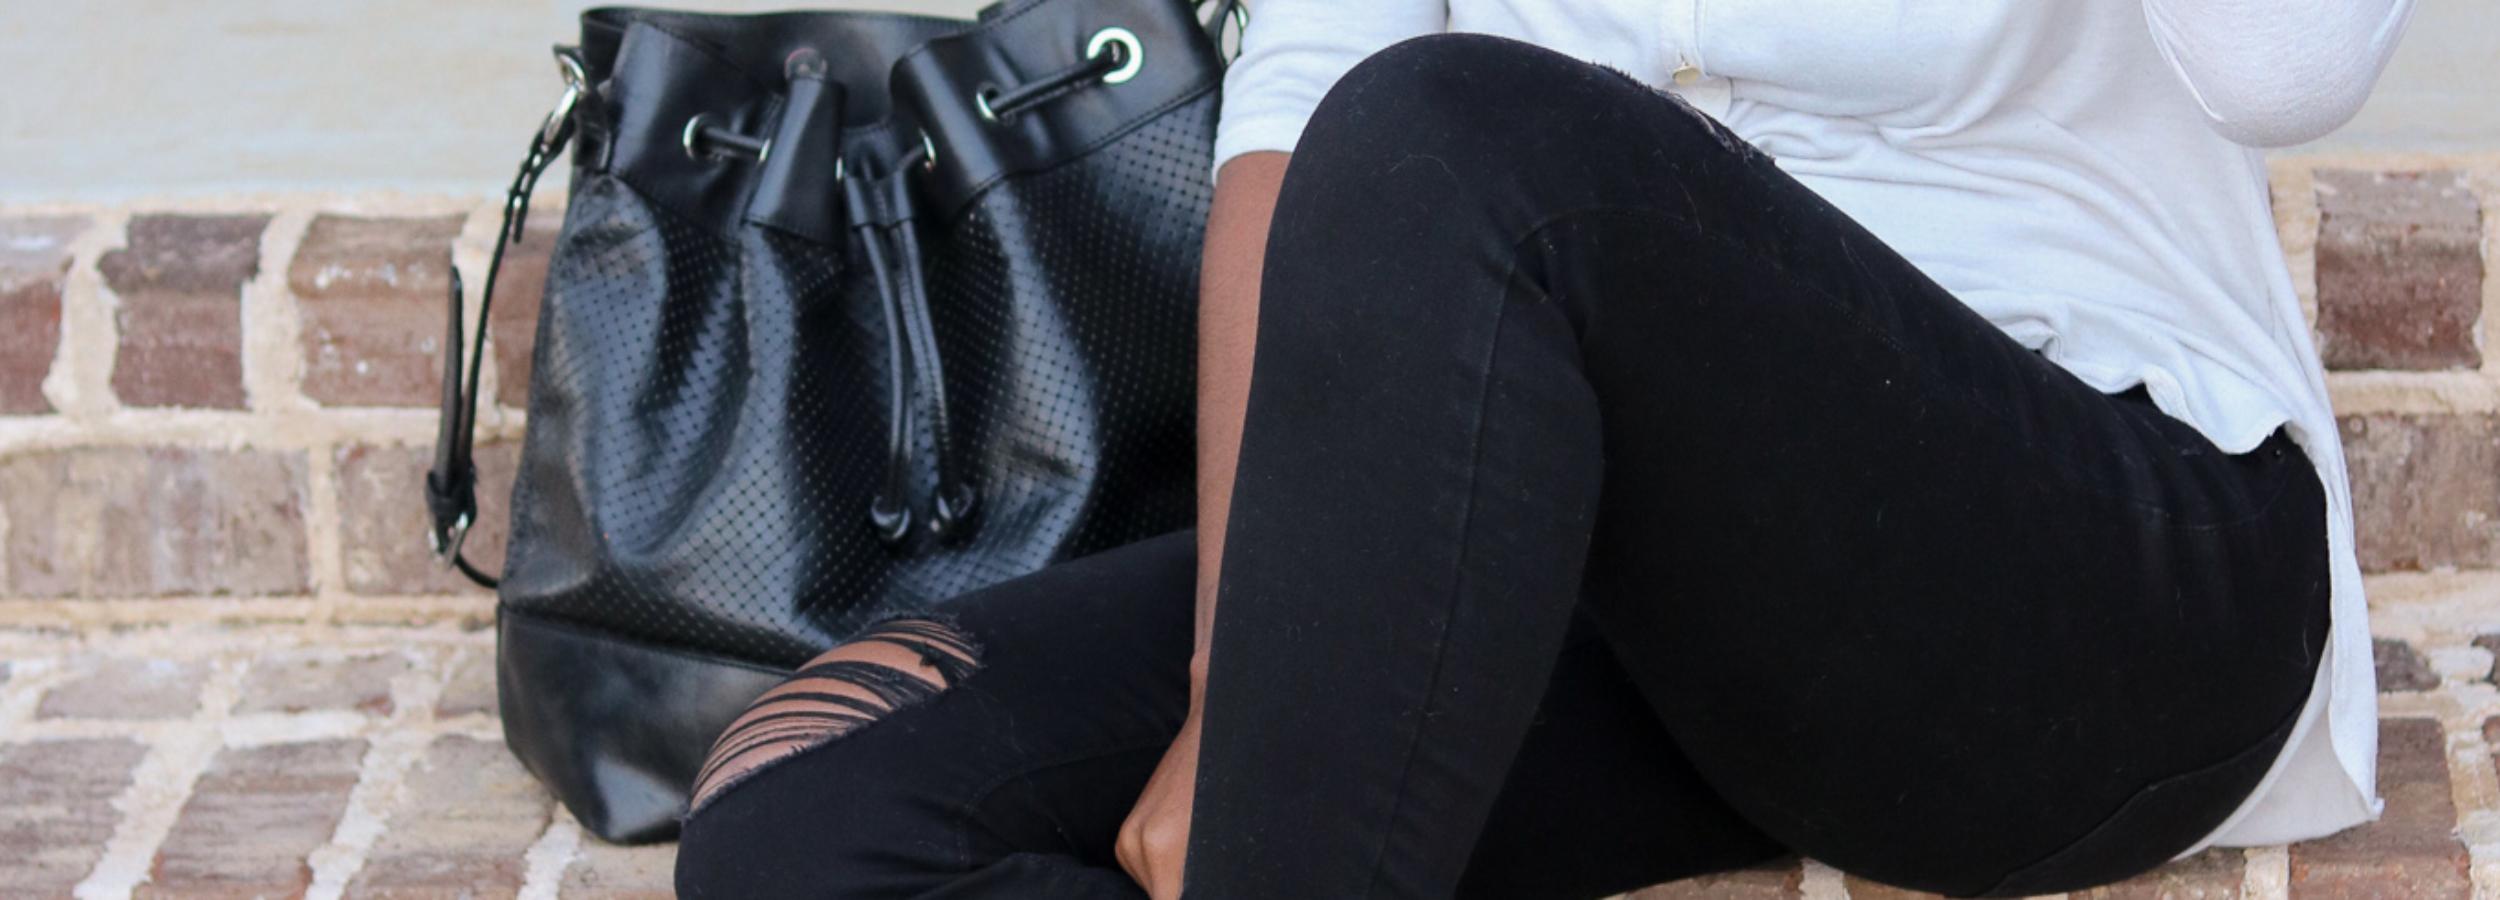 Distressed Denim + Snakeskin Ankle Boots